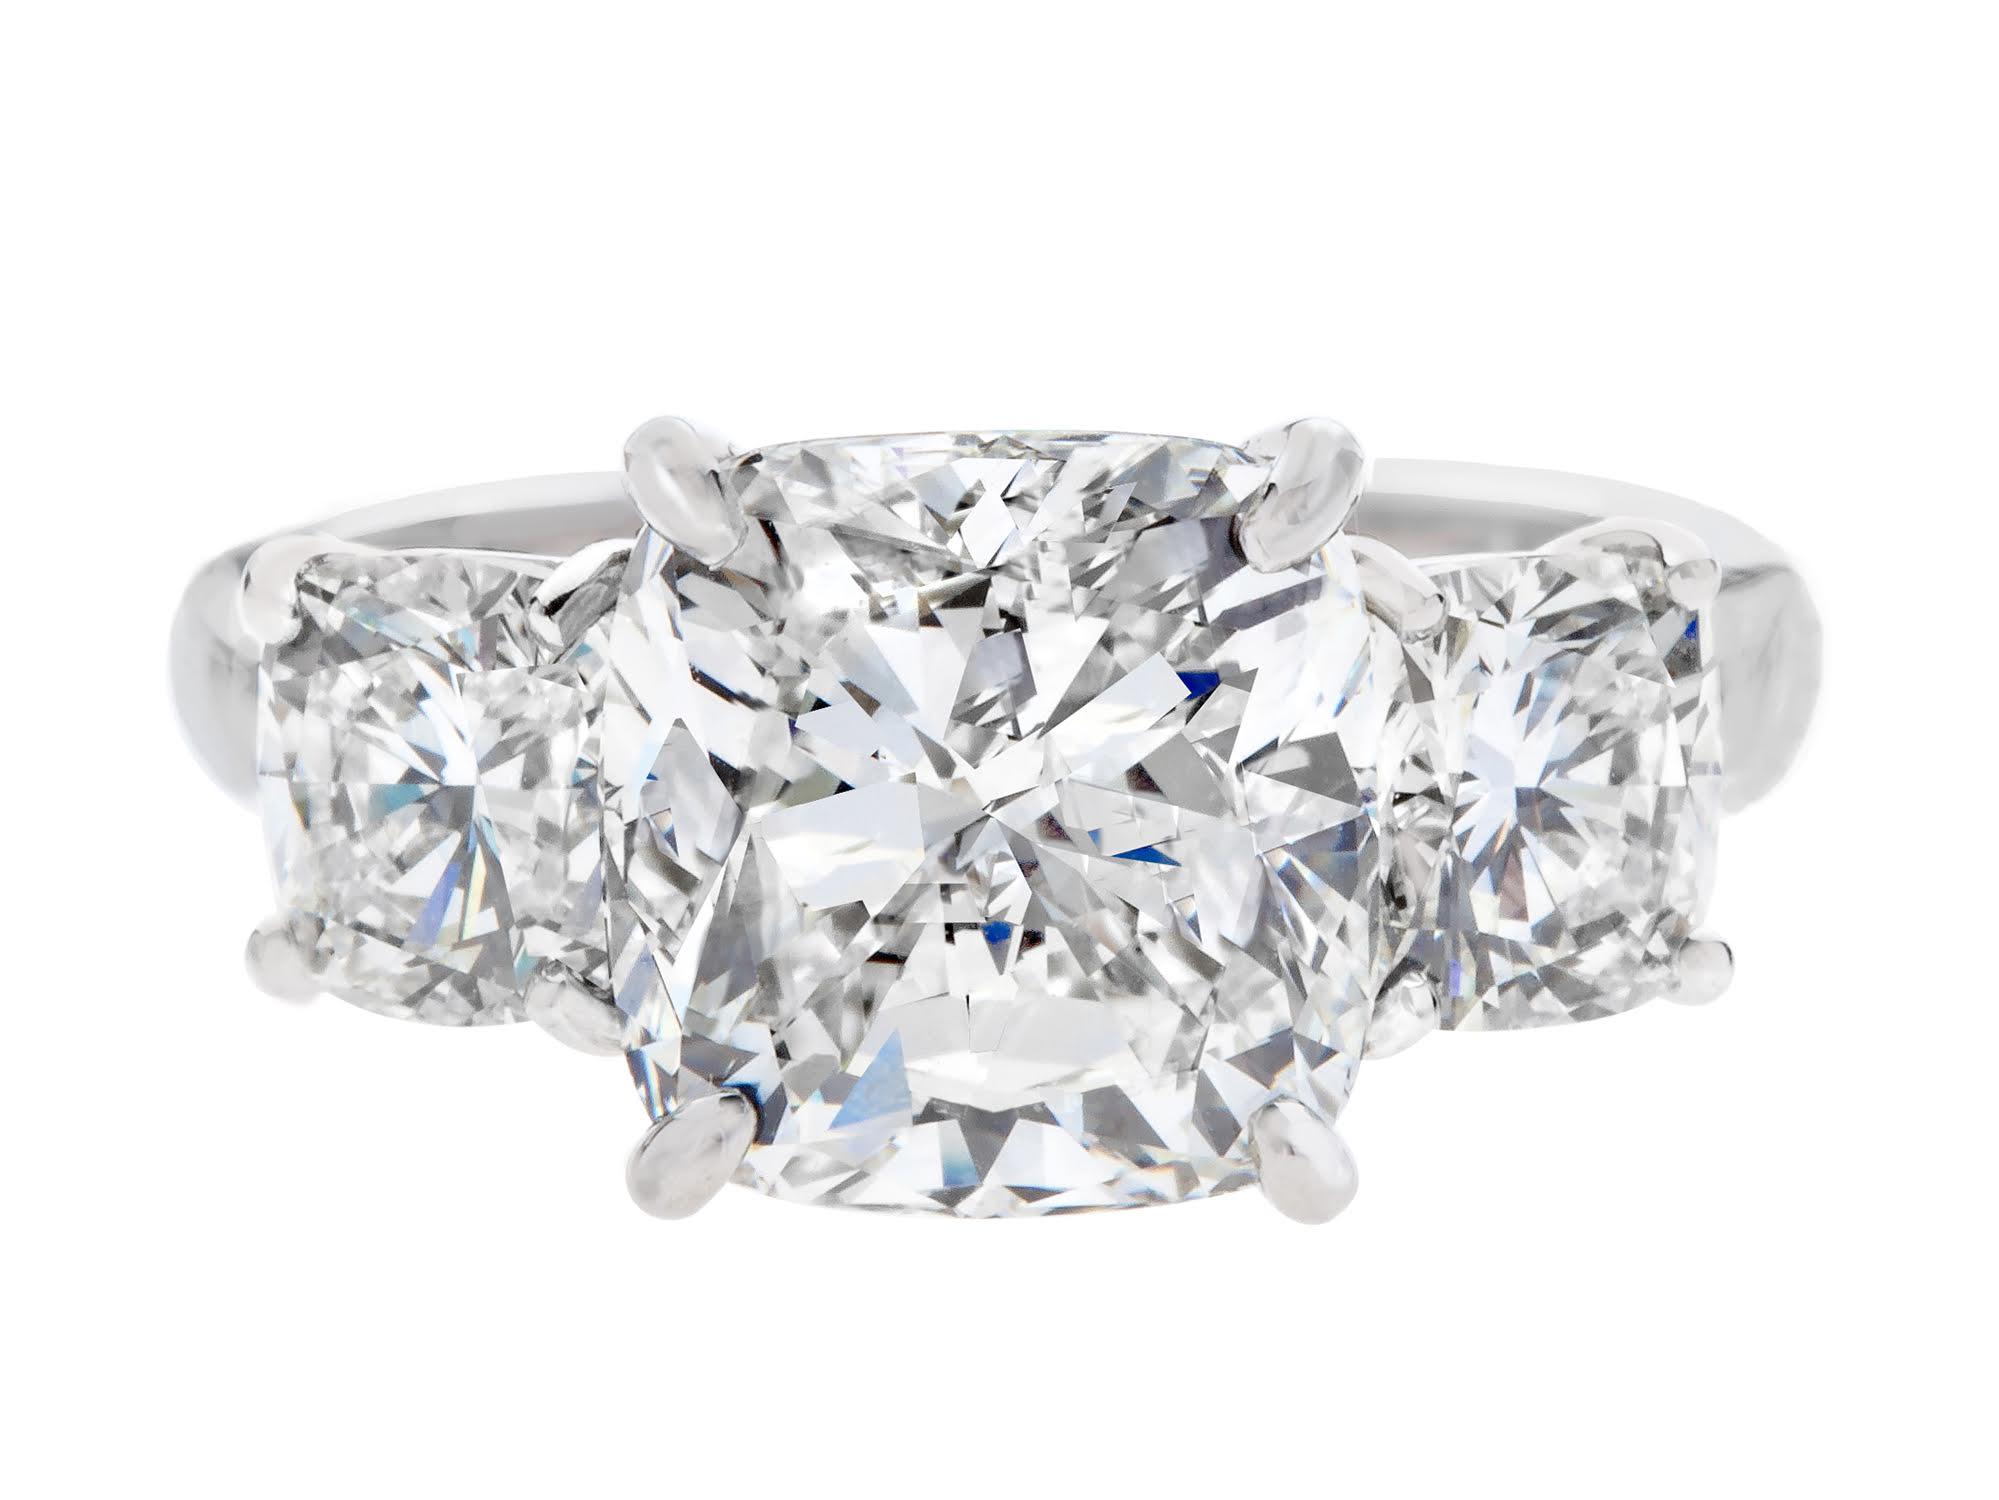 Gordon James 5.03 carat Cushion Cut 3 stone Diamond Ring; 7.09 carat total weight. Set in platinum. http://www.gordonjamesdiamonds.com/products/diamond-rings/tsr-841